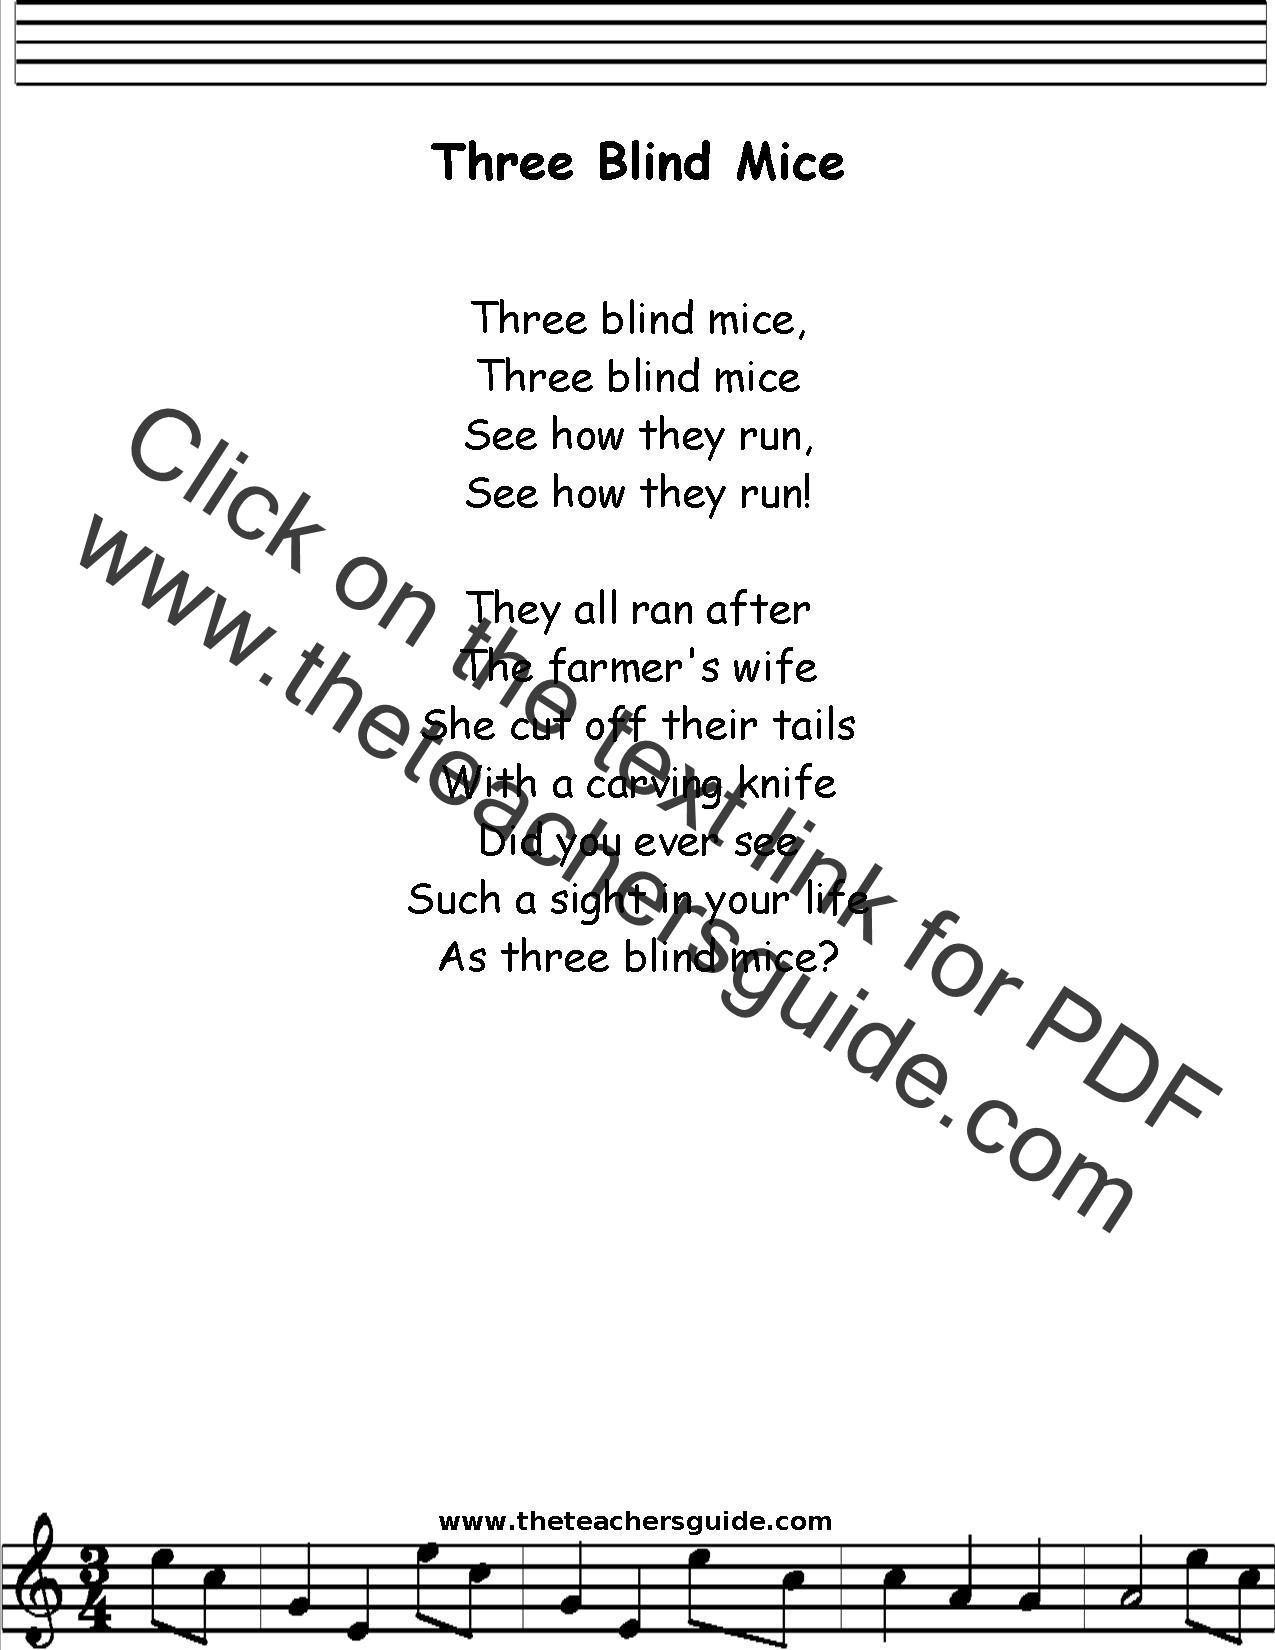 Three Blind Mice lyrics printout